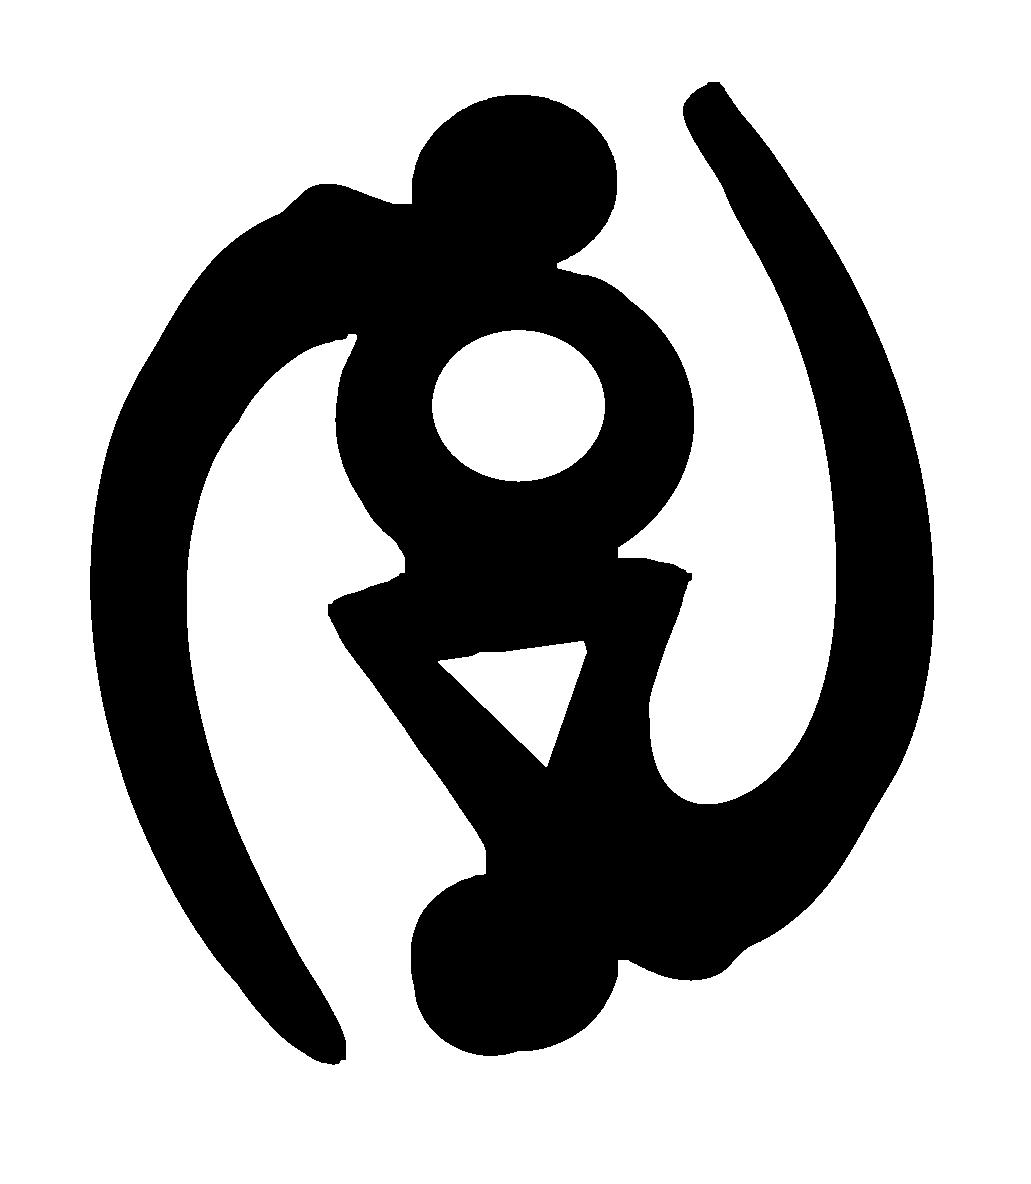 Image Luchat Symbolg Stargate Renaissance Wiki Fandom